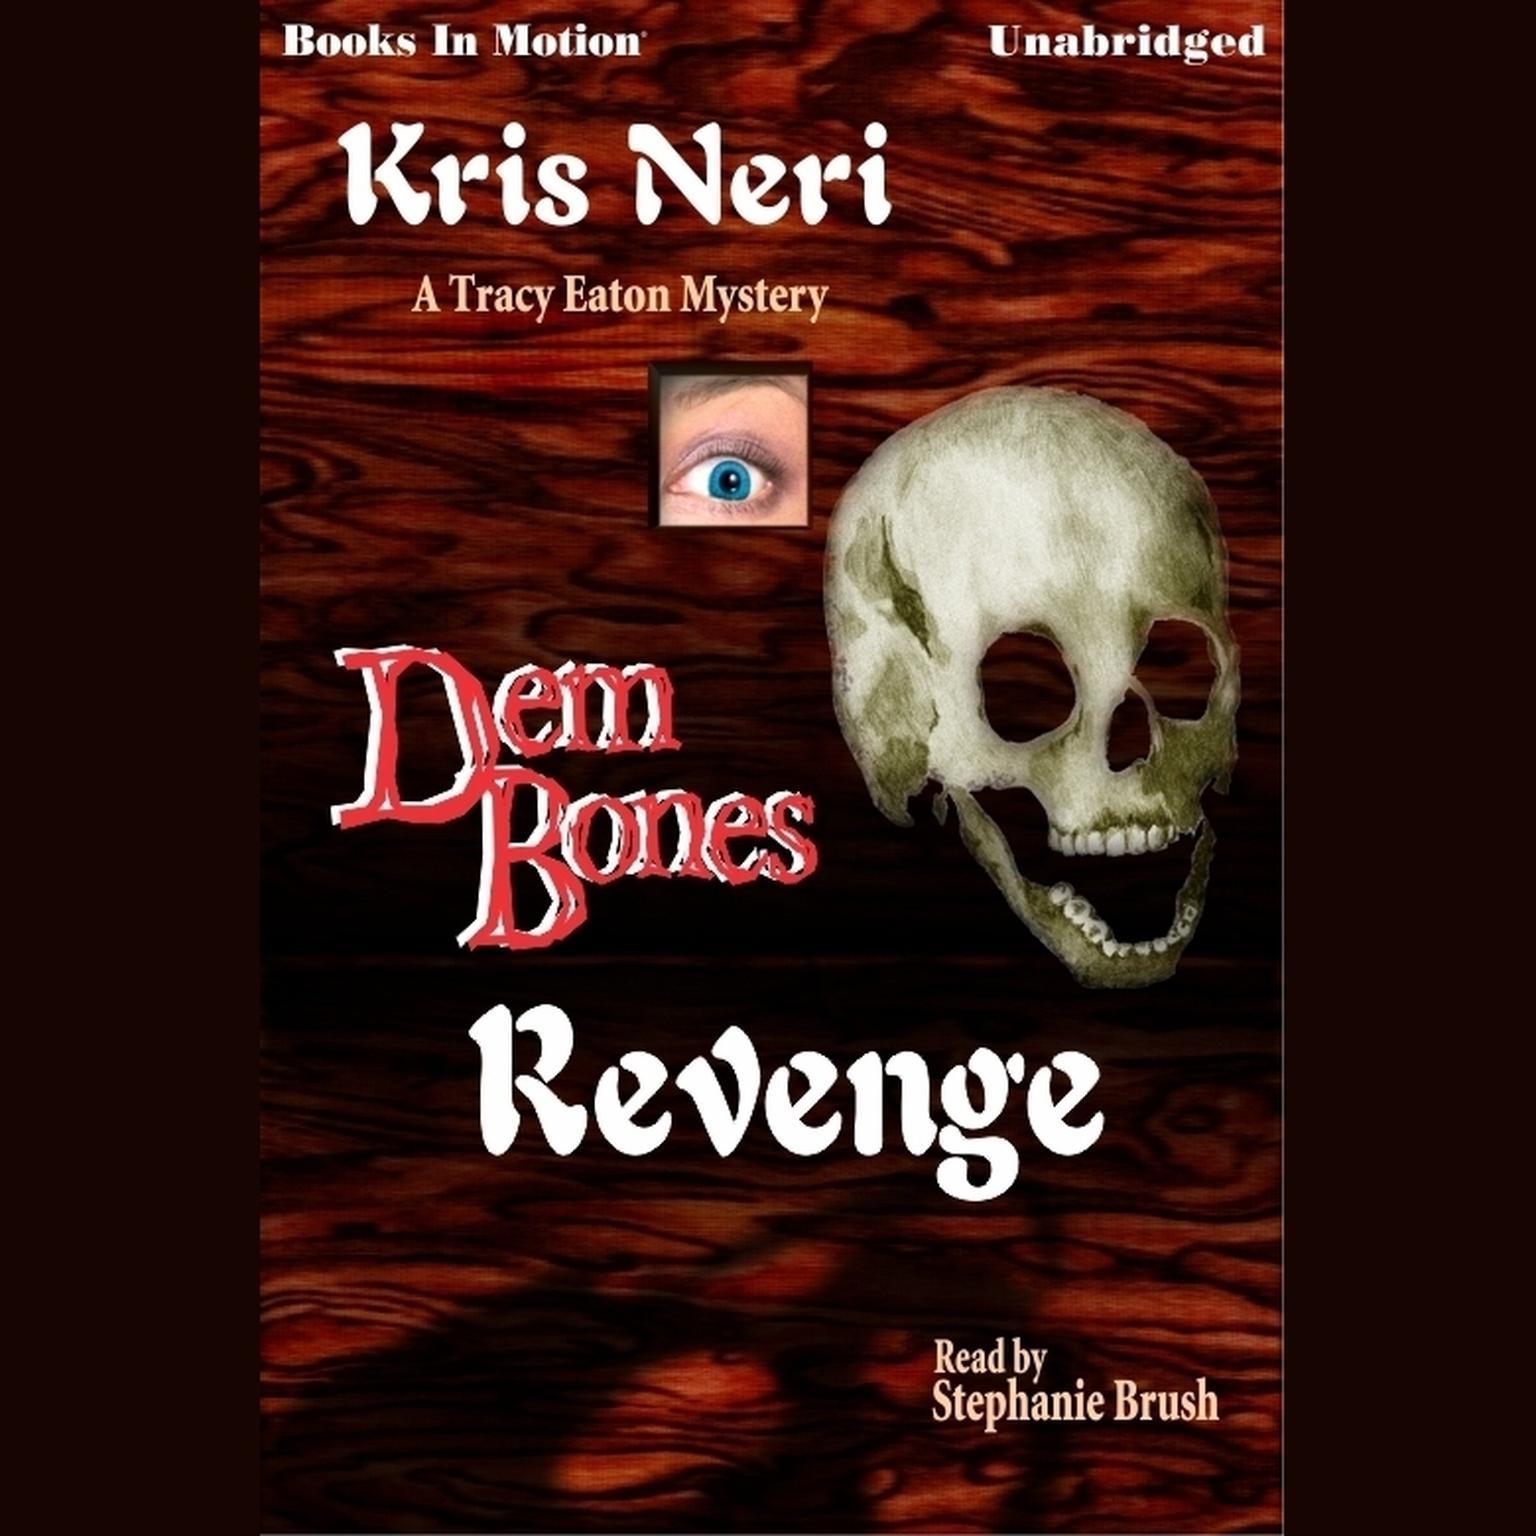 Dem Bones Revenge Audiobook, by Kris Neri